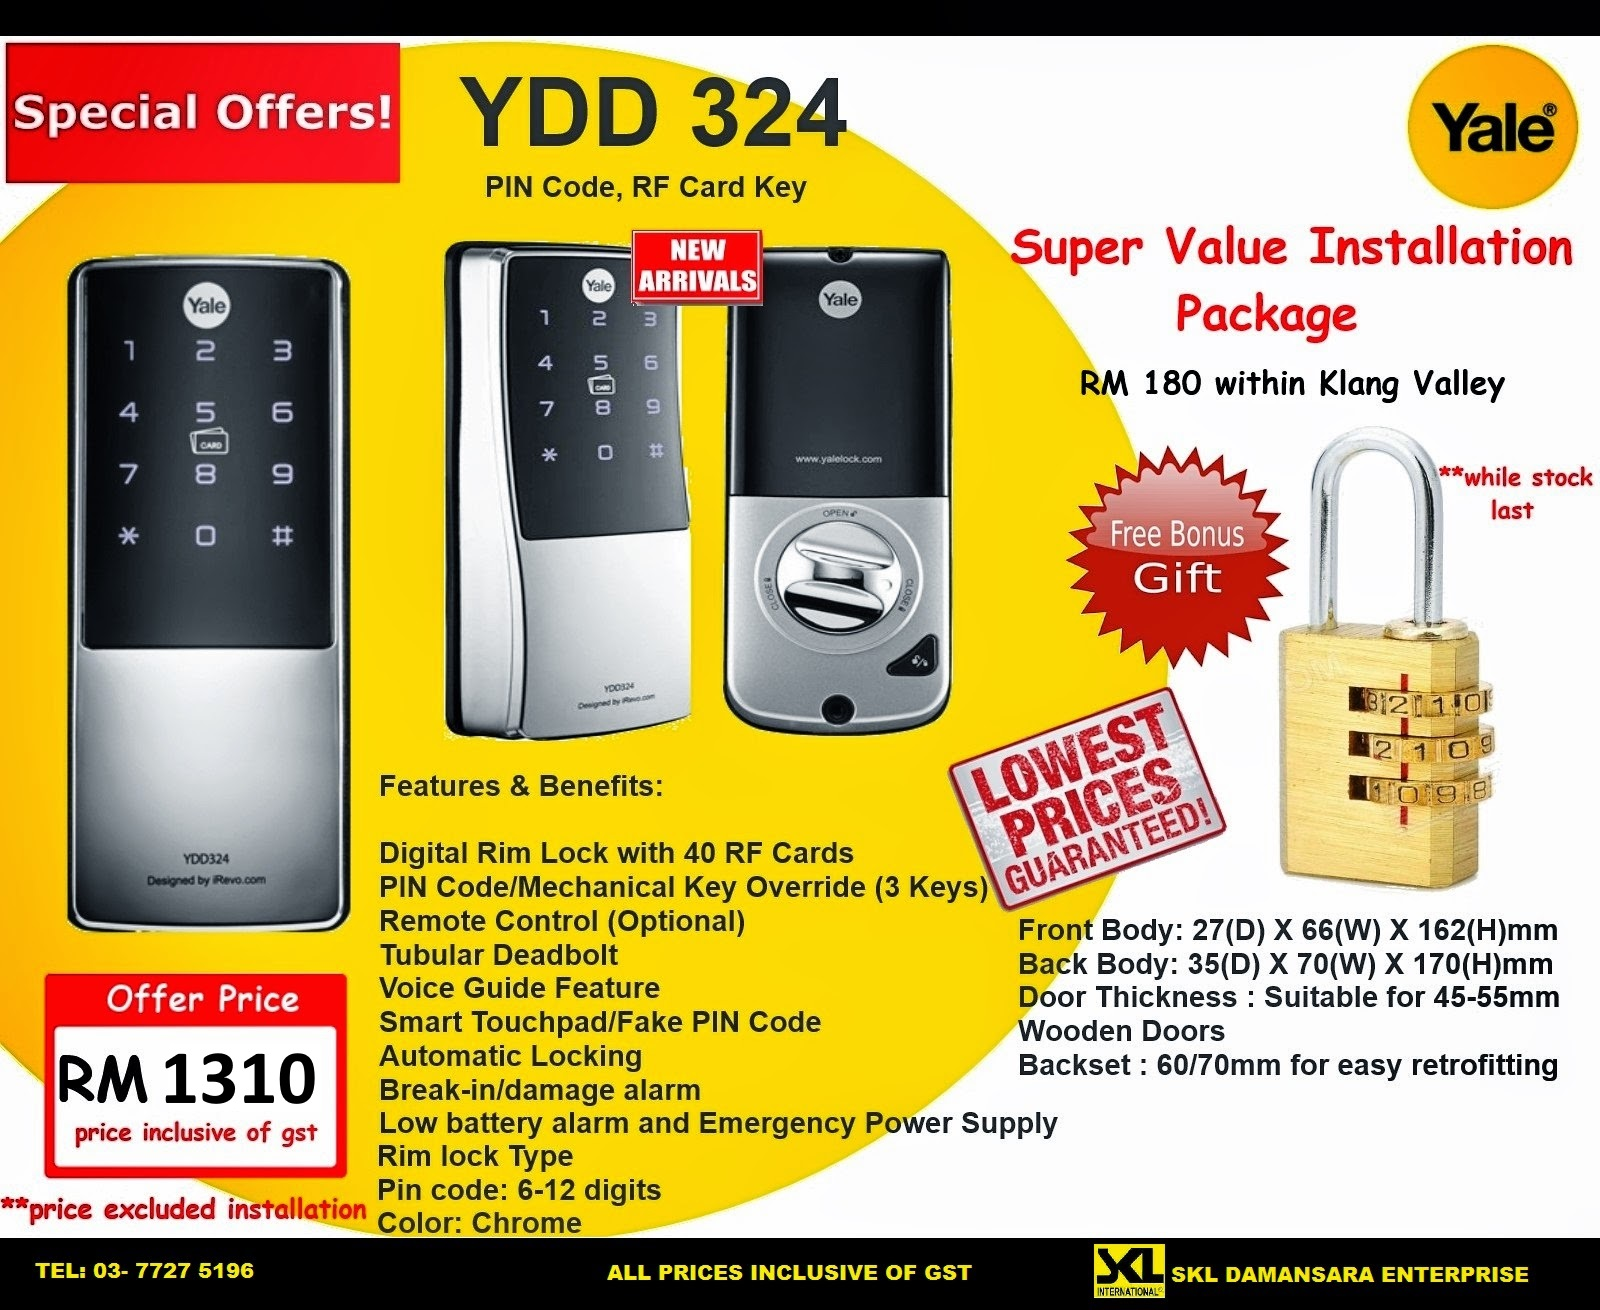 yale door am digital pull ymg push i sale cny end fingerprint lock fingerp htm doors